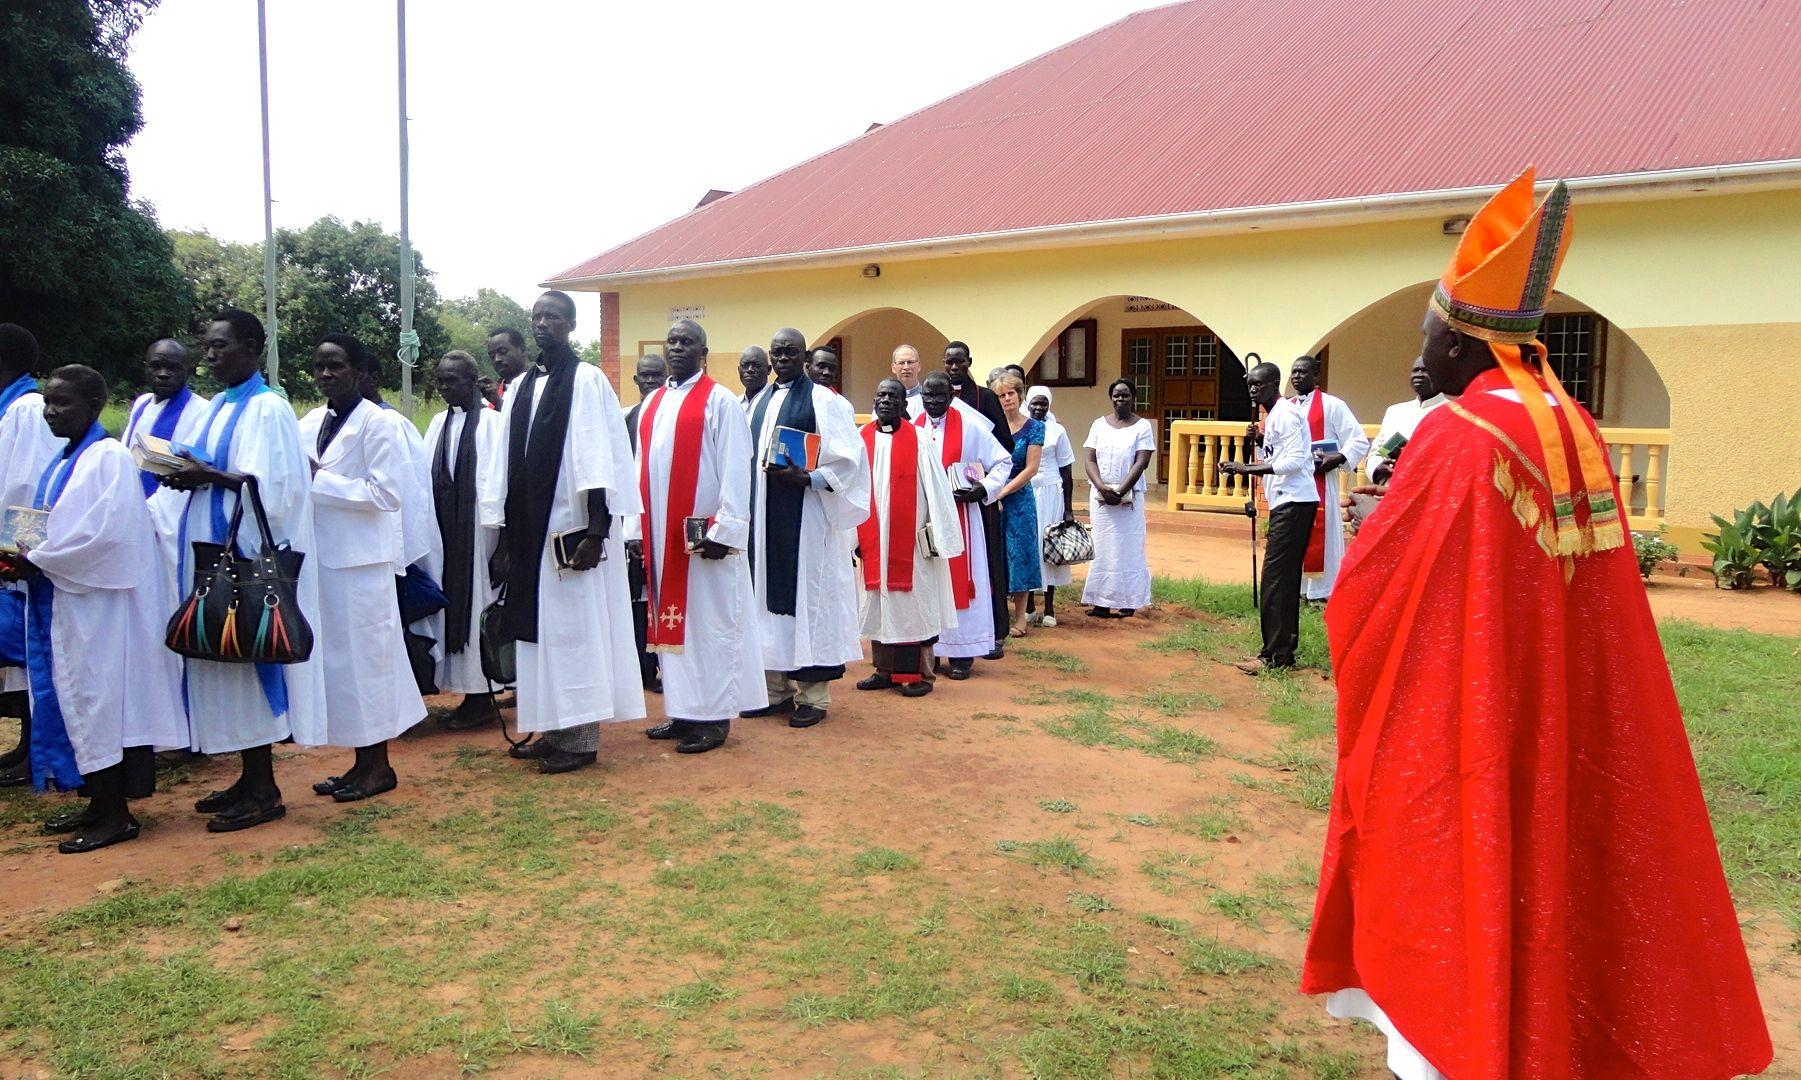 2b procession